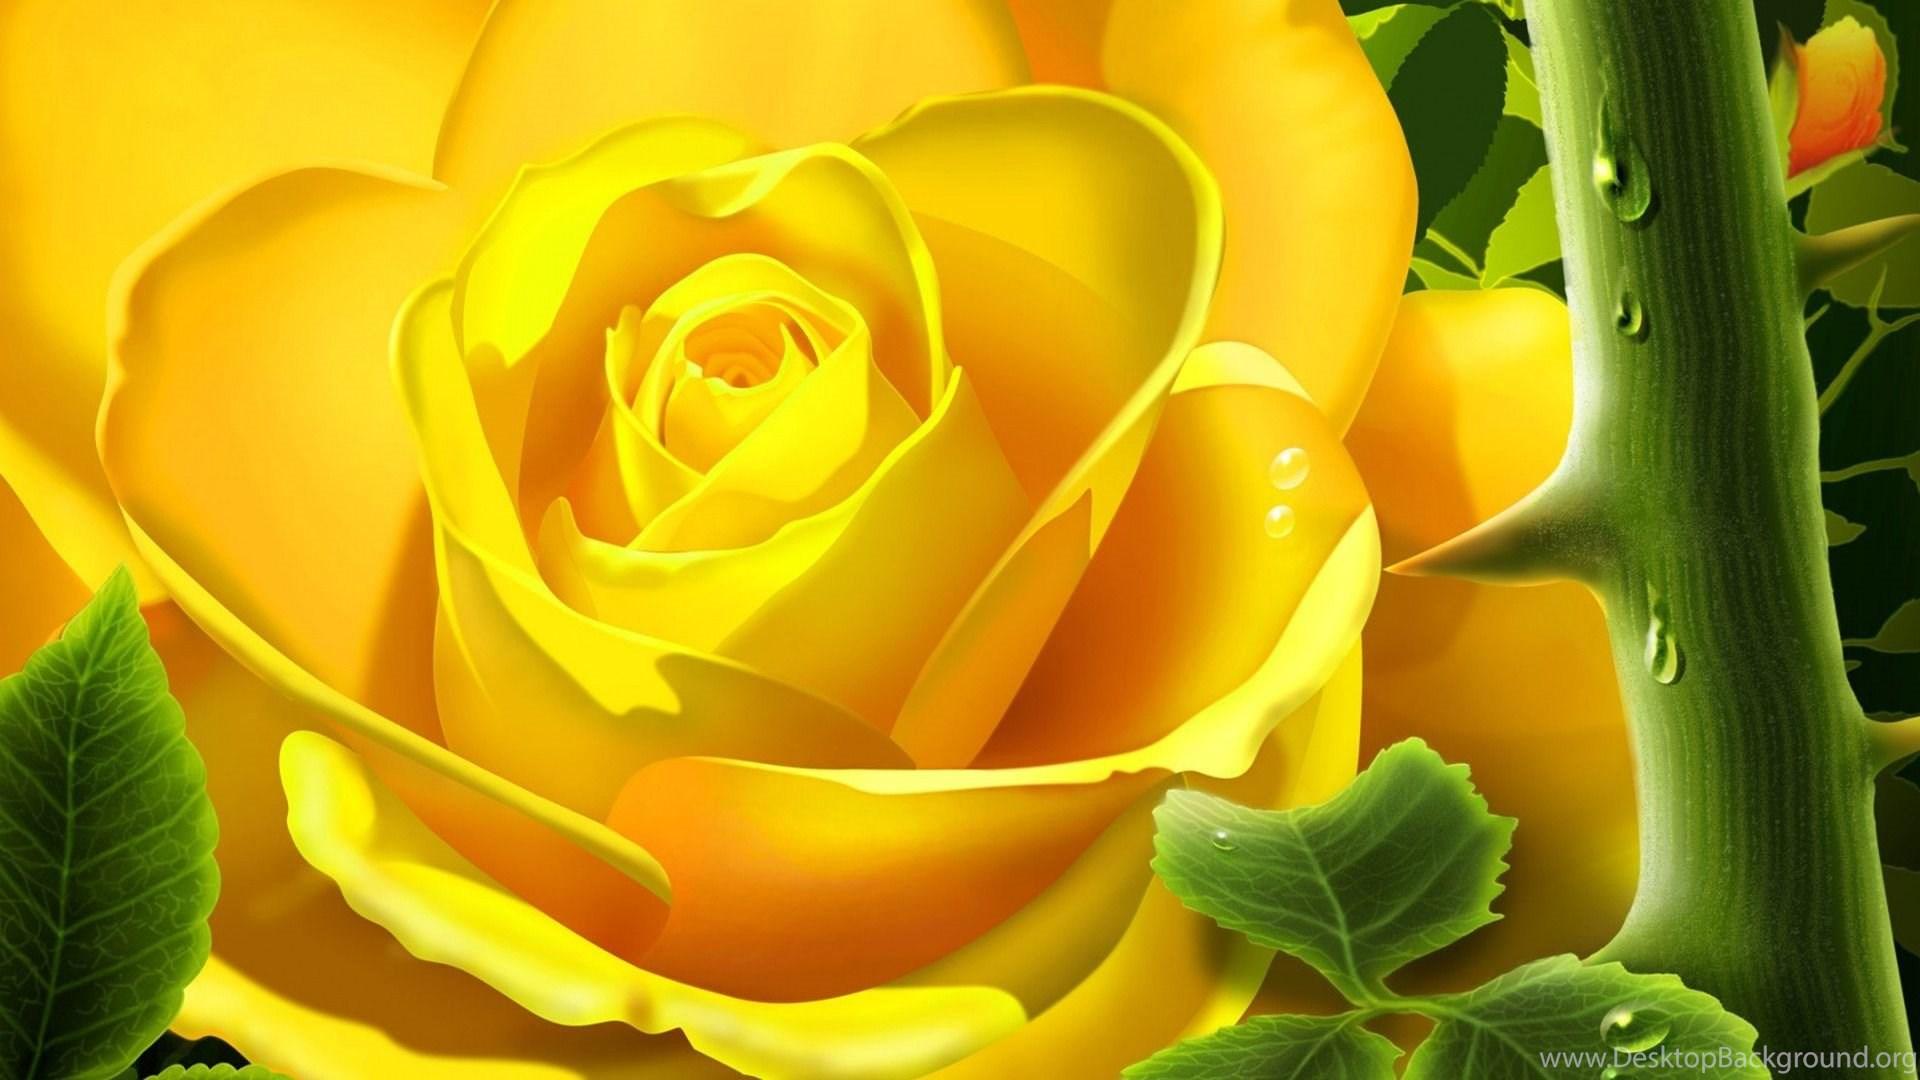 Yellow Rose Hd Wallpapers Desktop Background